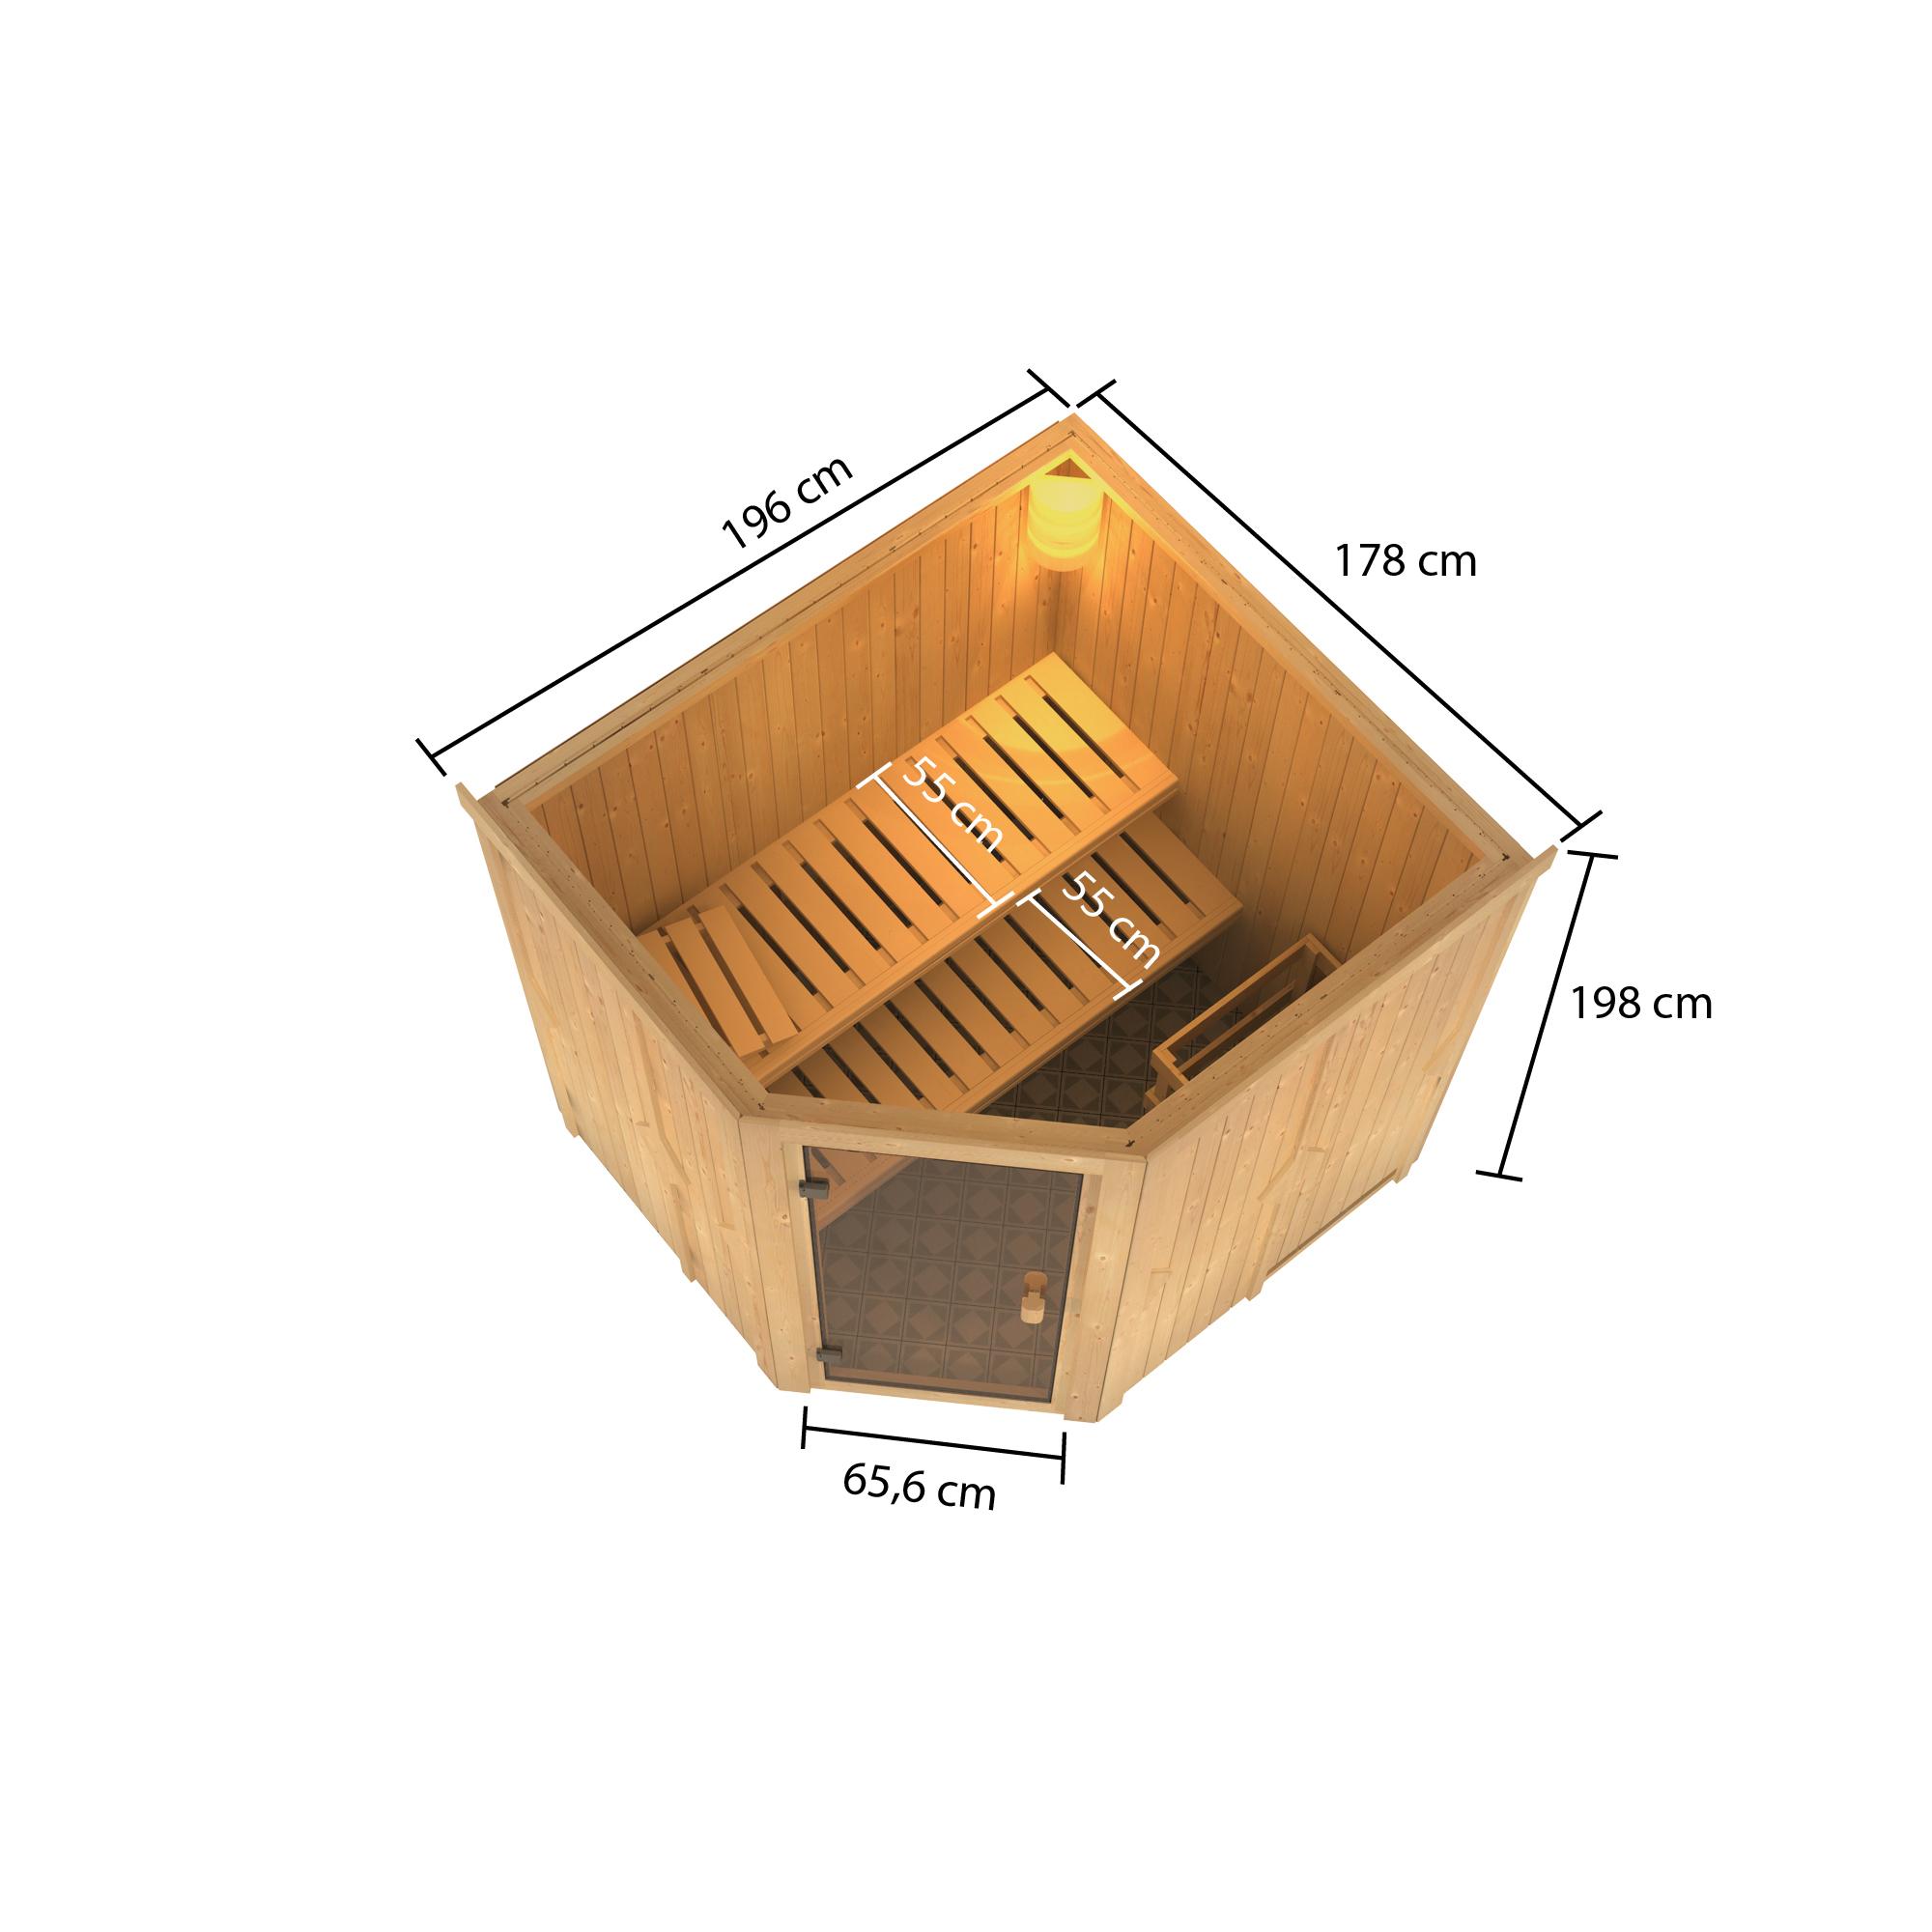 Woodfeeling Sauna Bodo 68mm ohne Saunaofen Bild 3